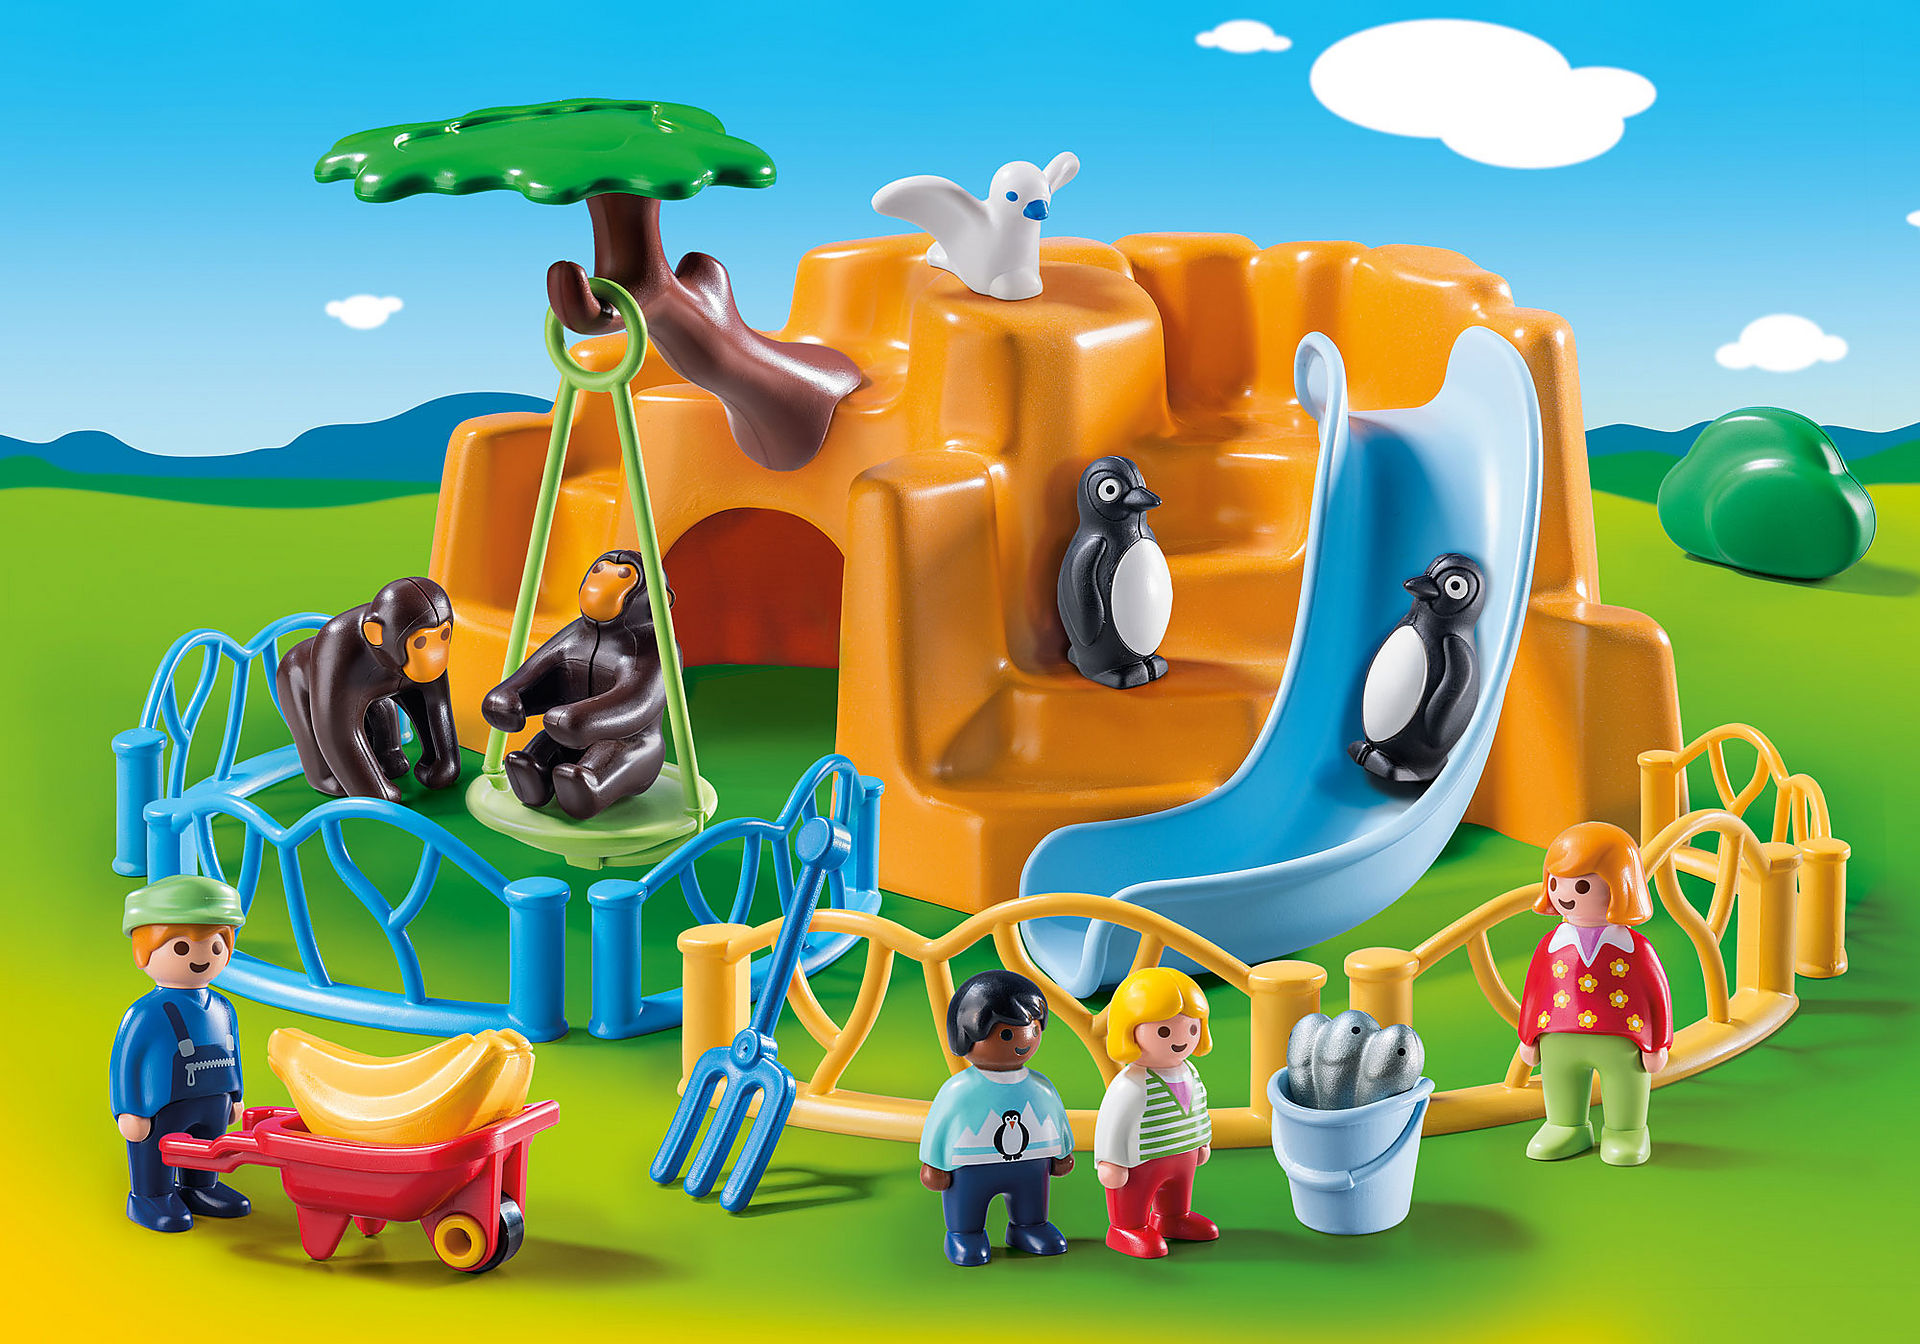 9377 Parc animalier  zoom image1